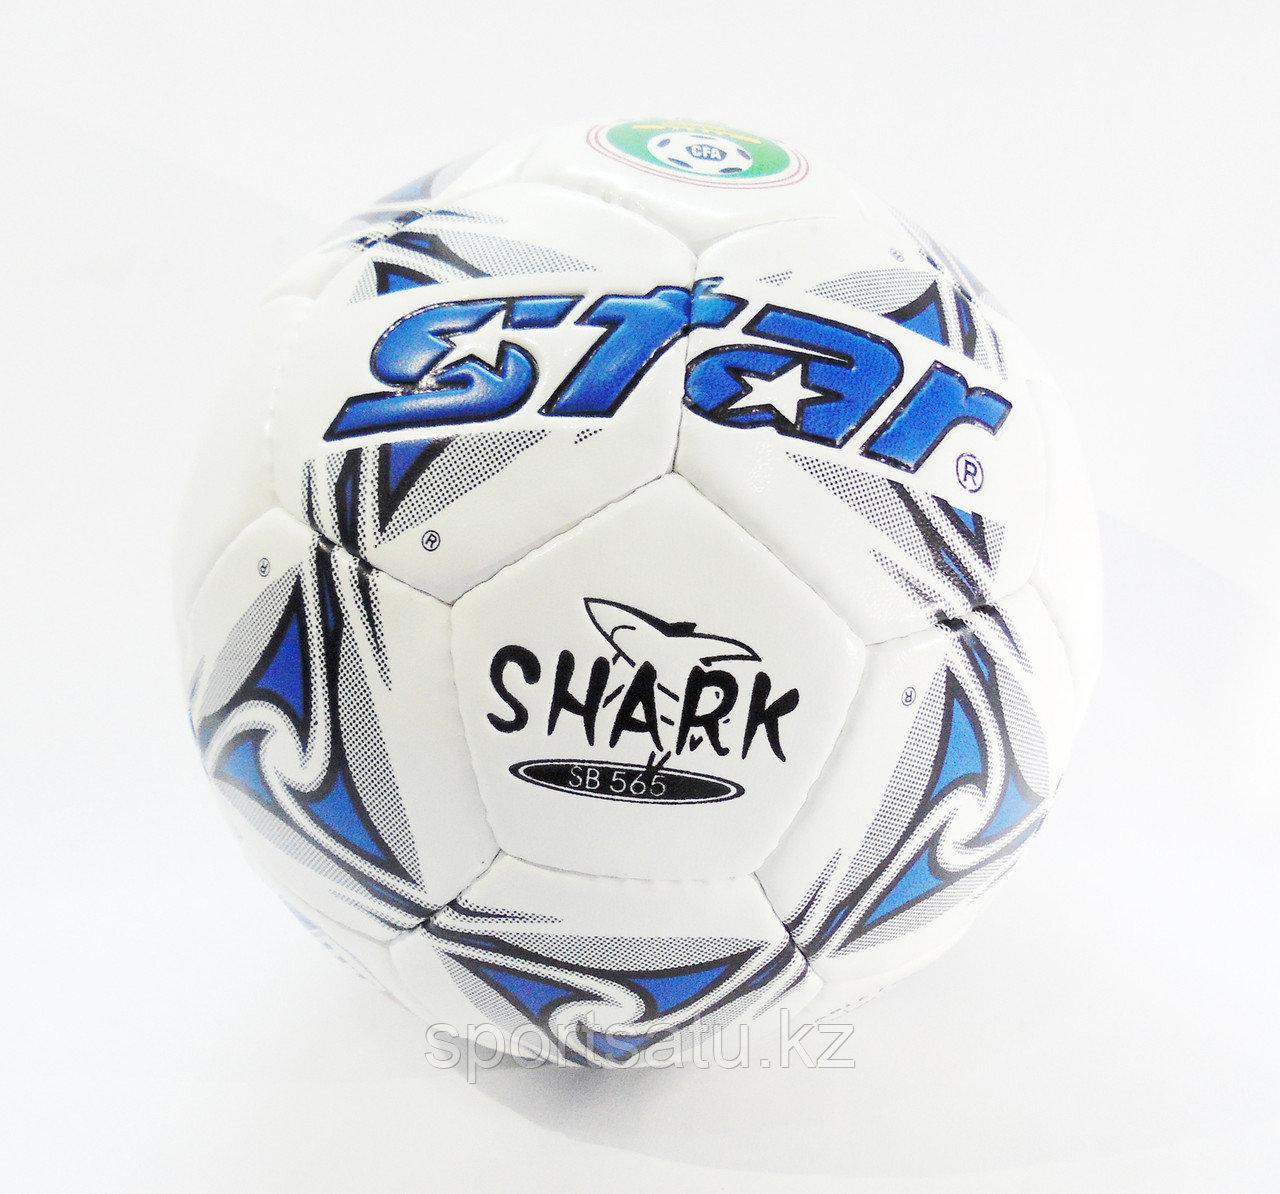 Футбольный мяч Star SHARK